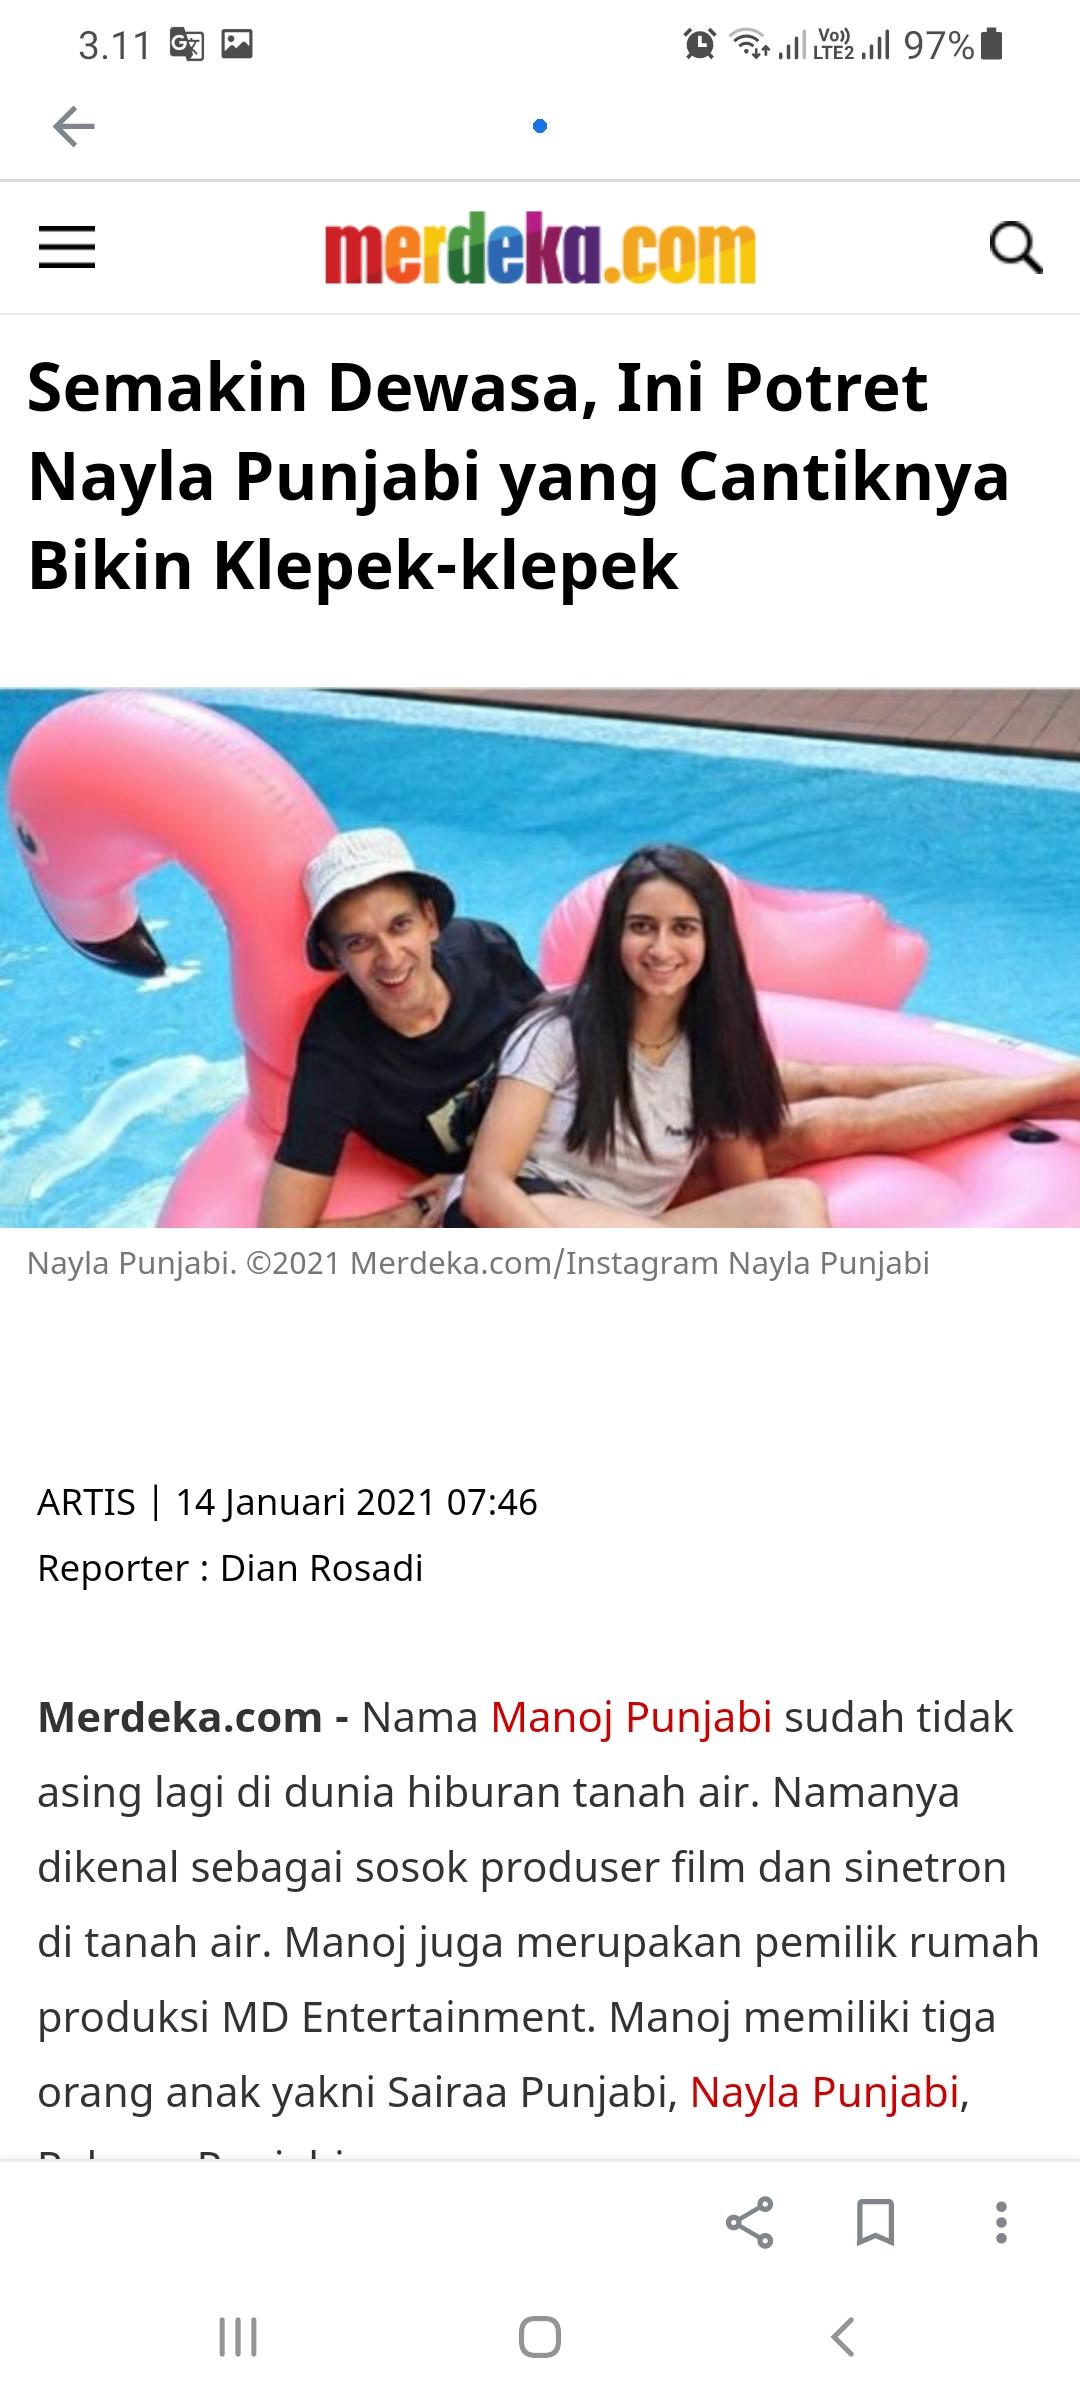 Semakin Dewasa, Ini Potret Nayla Punjabi yang Cantiknya Bikin Klepek-klepek -Merdeka.com